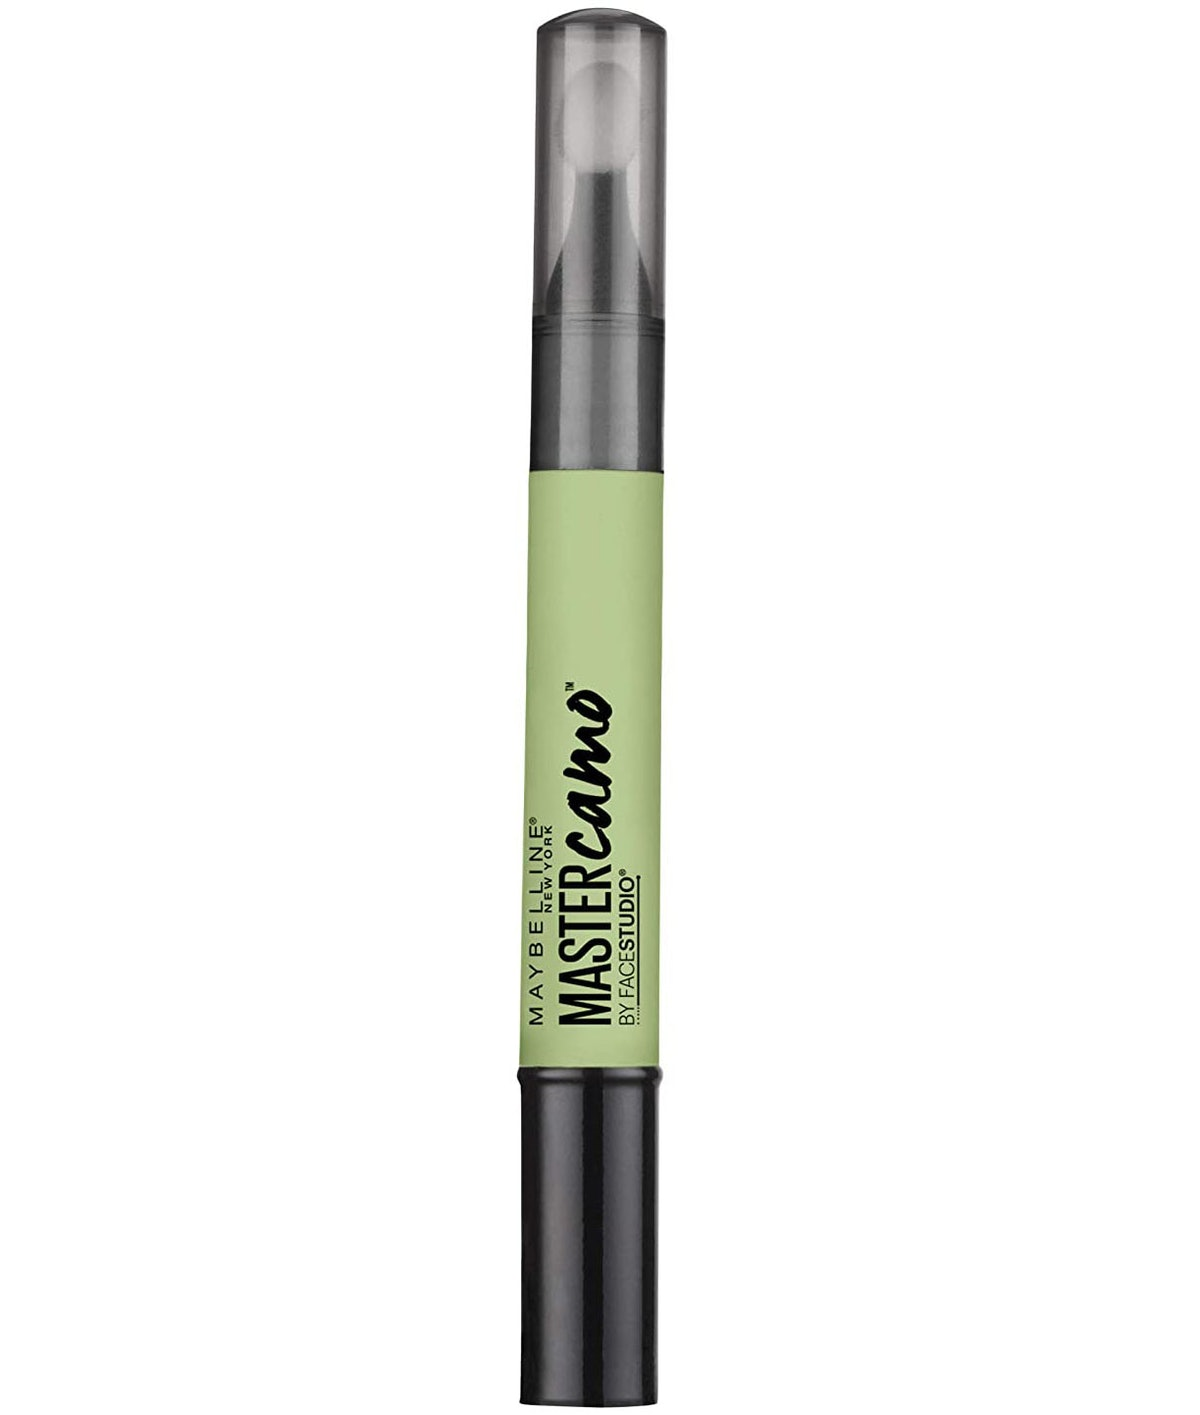 Maybelline New York Master Camo Color Correcting Pen